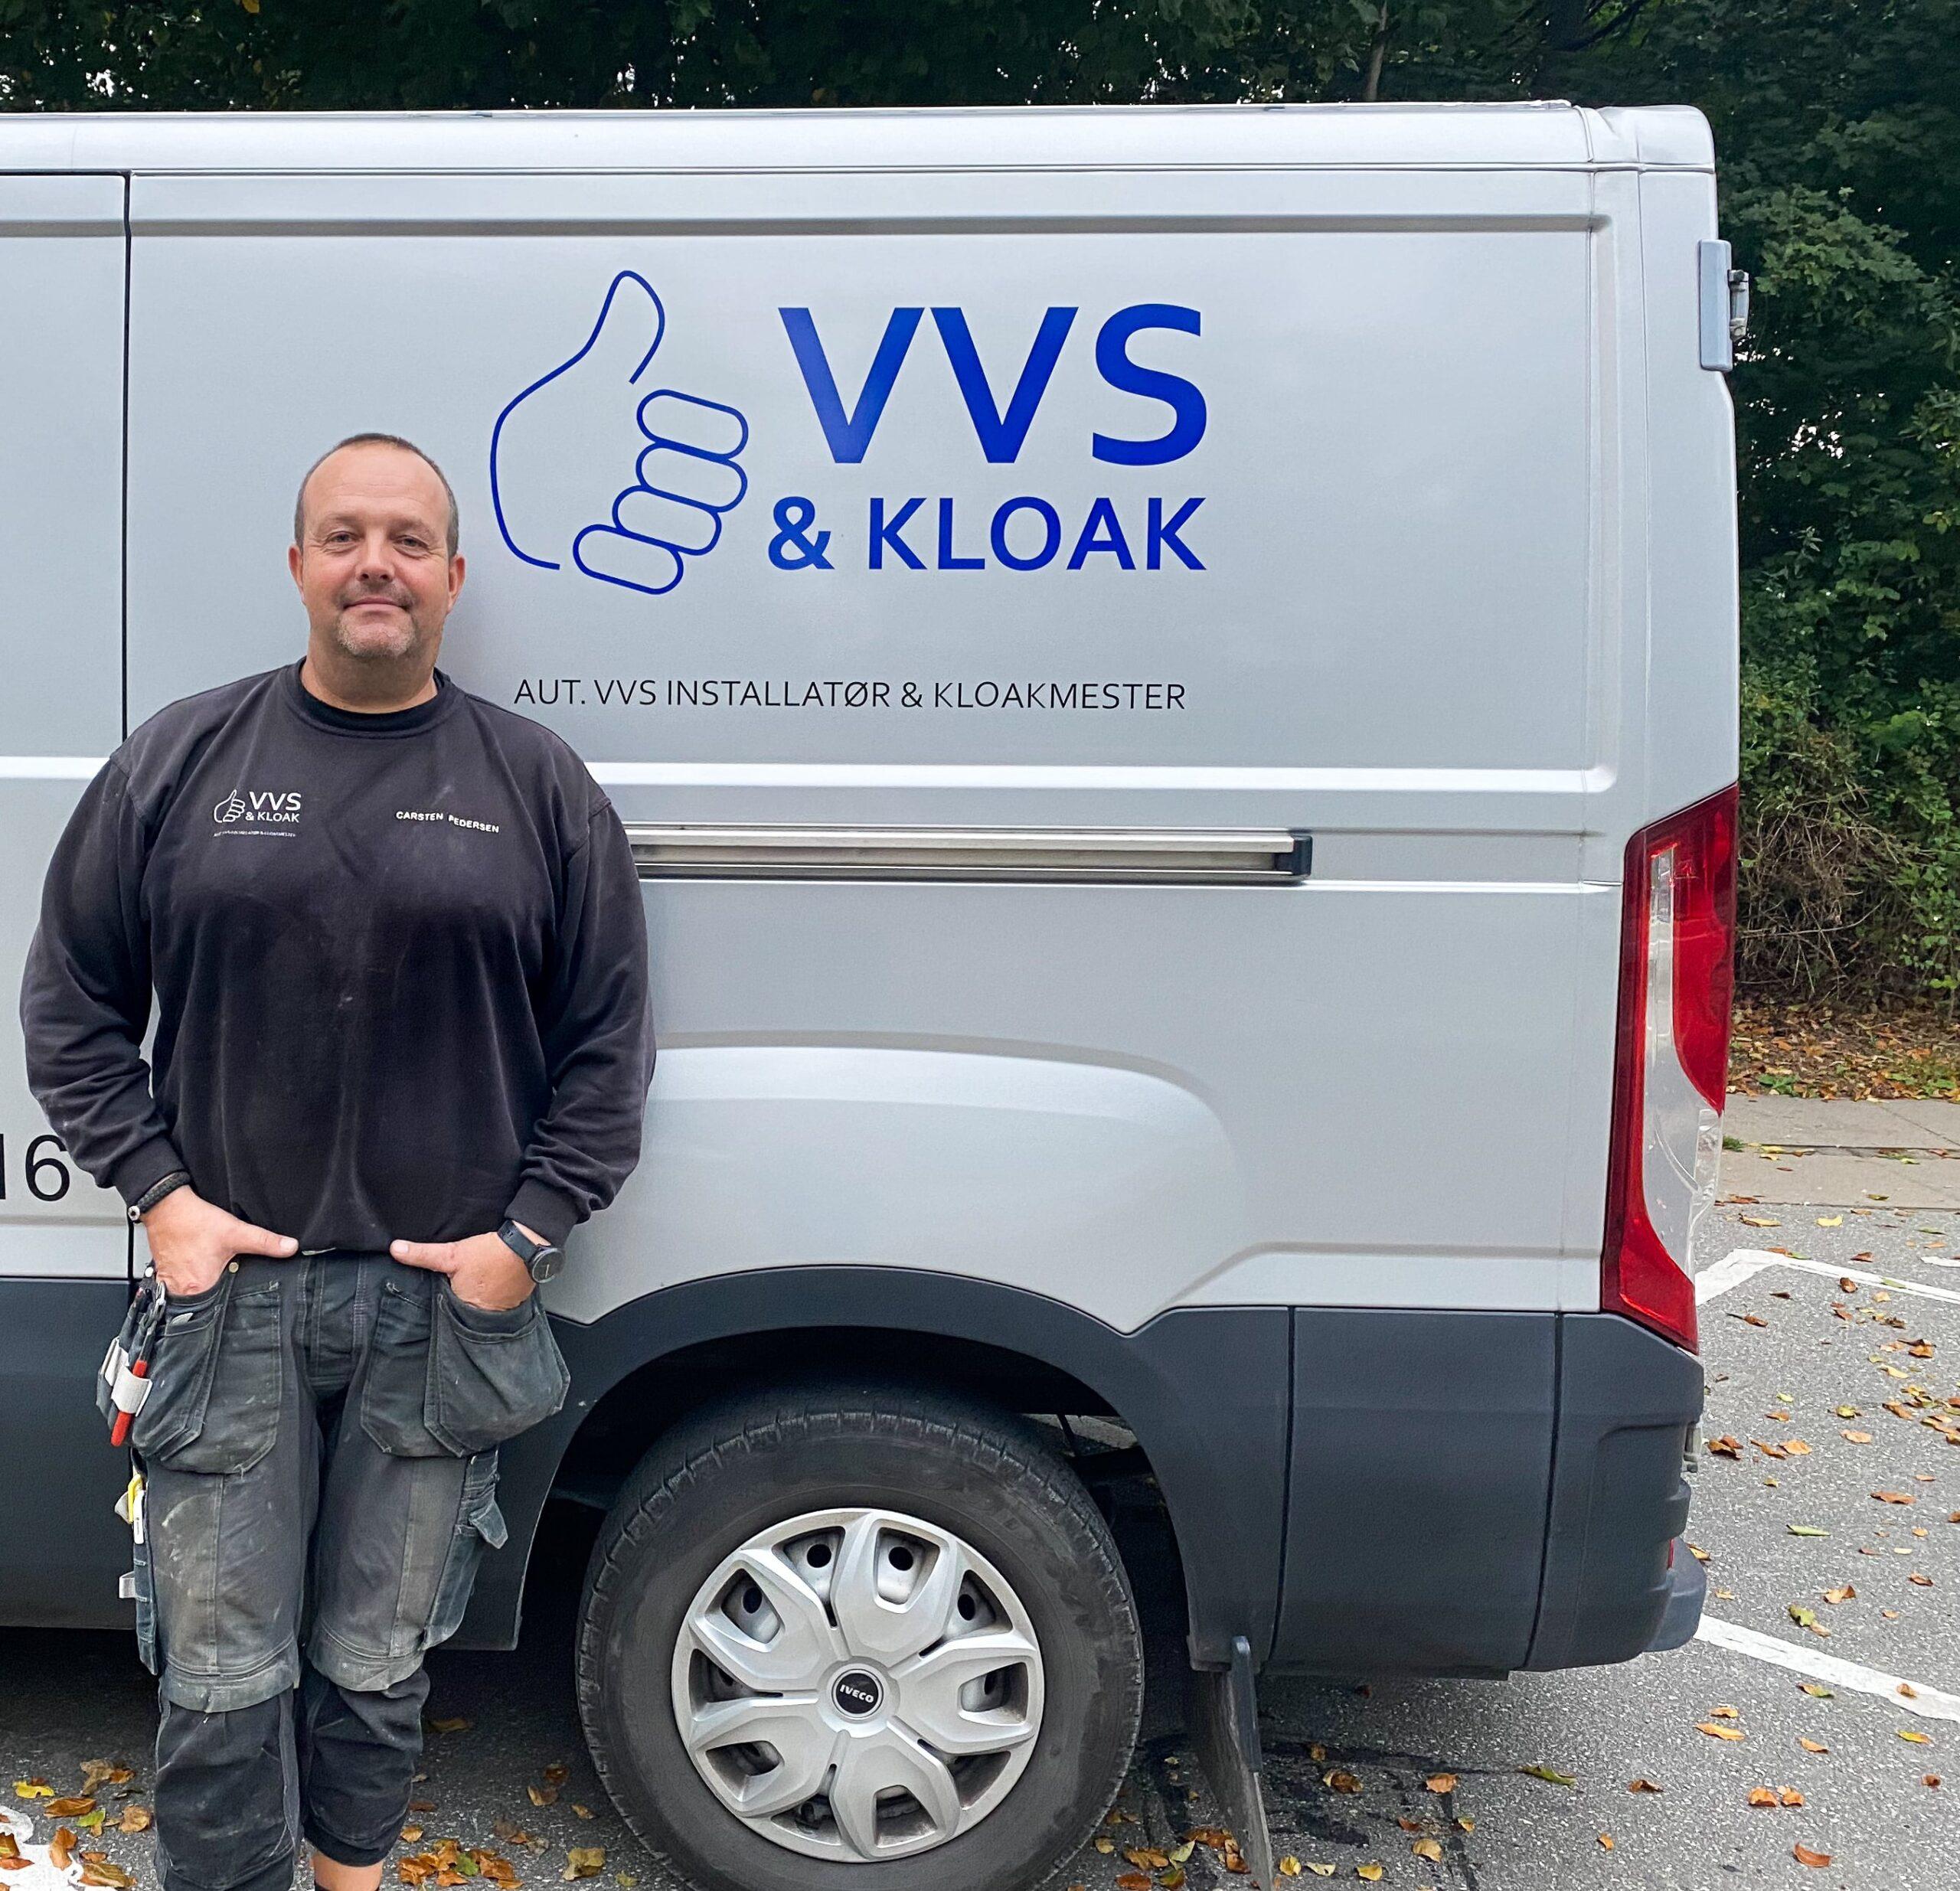 Autoriseret VVS og kloakmester foran bil